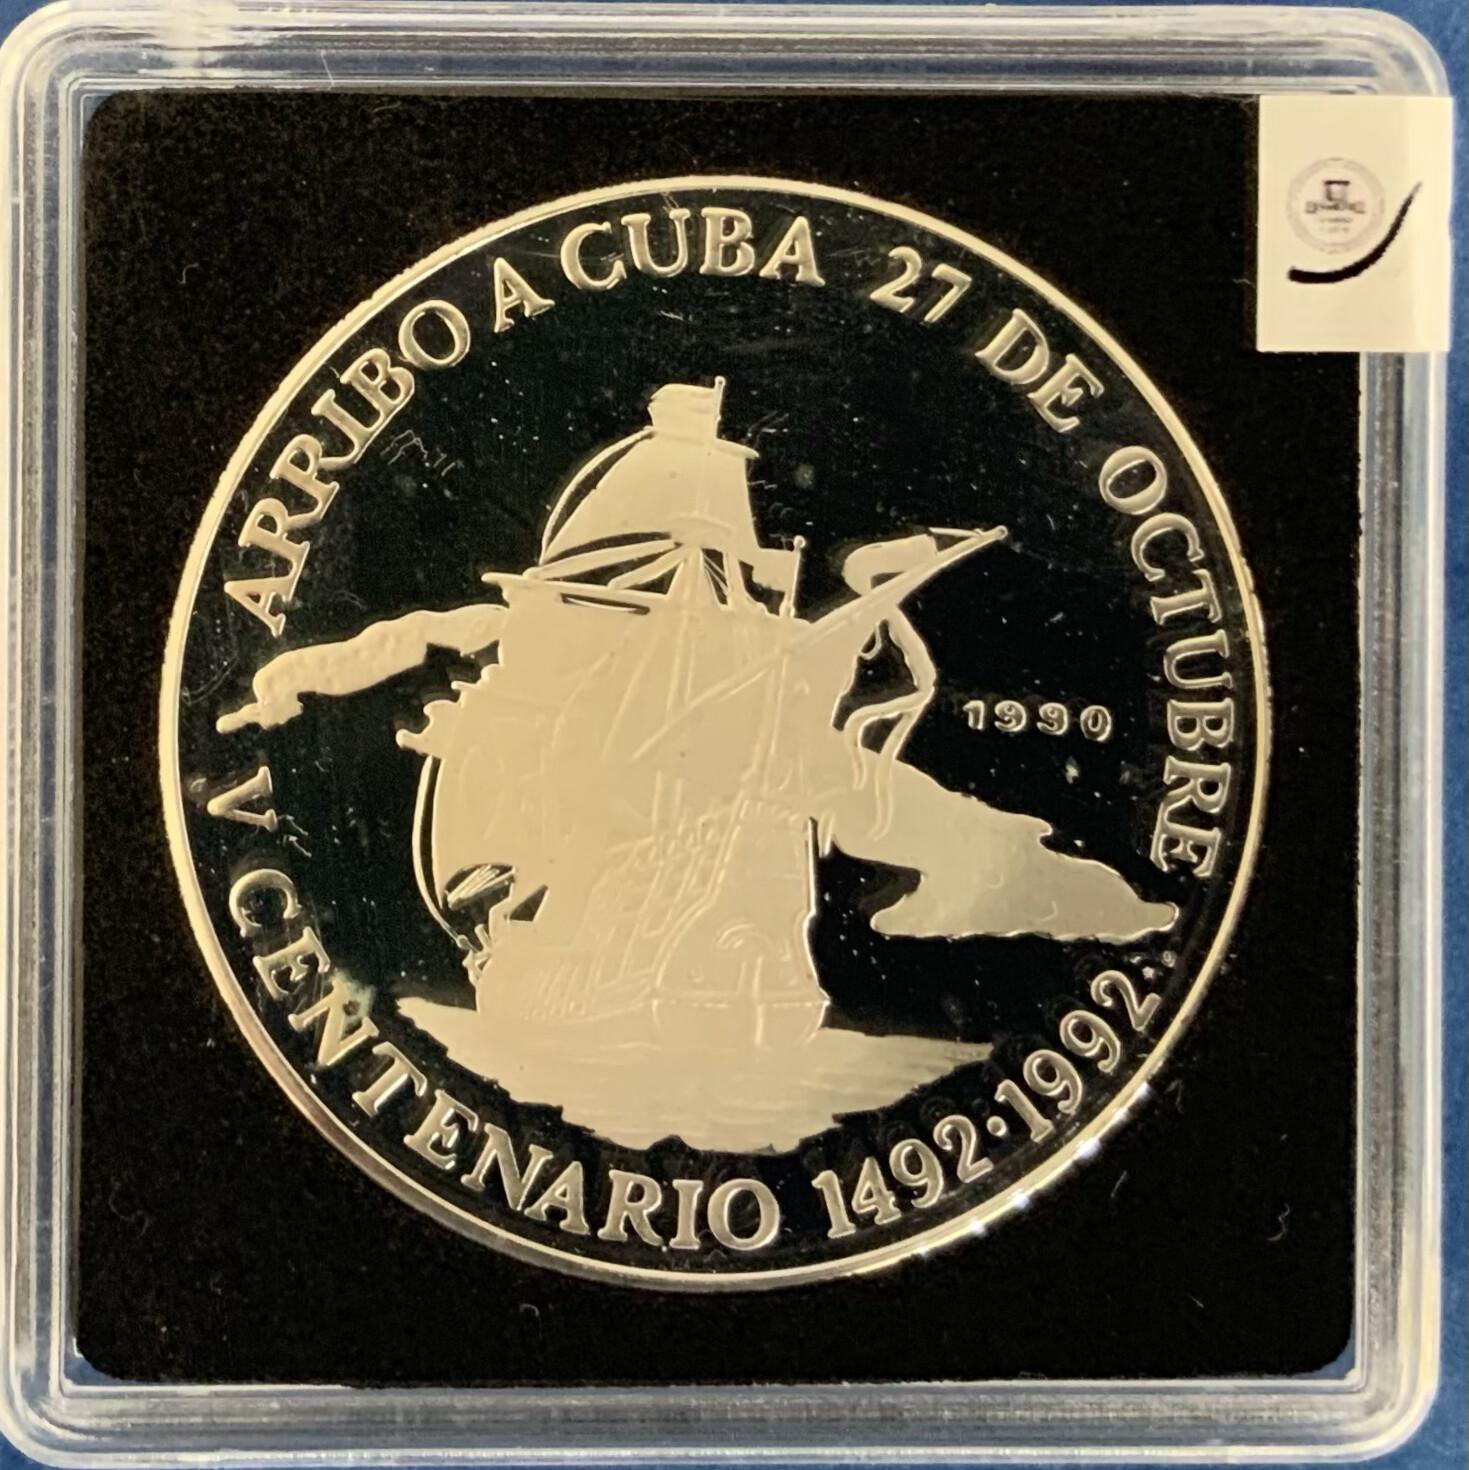 Arrival in Cuba 10 Pesos 1990